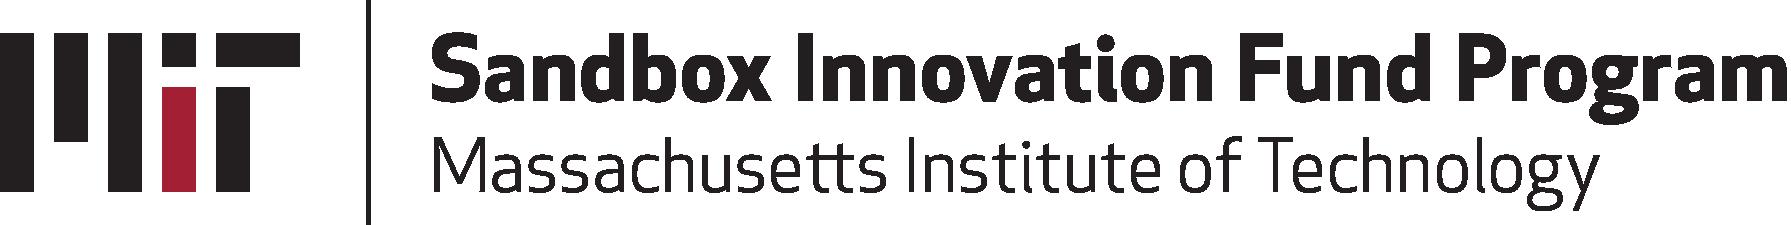 MIT Sandbox Innovation Fund Program